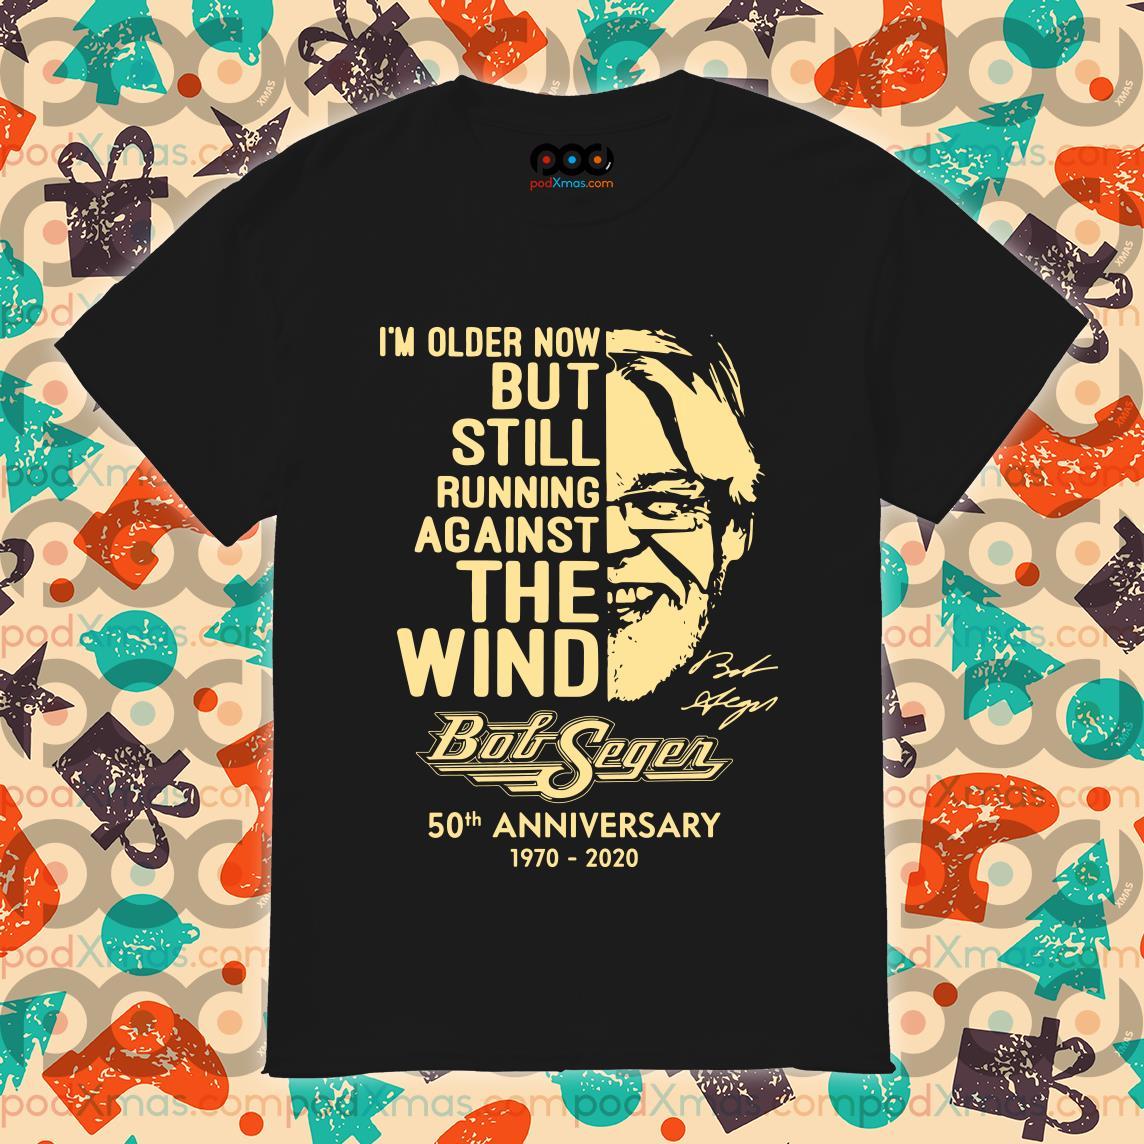 I'm older none but still running against the wind Bob Seger 50th anniversary 1970 2020 shirt